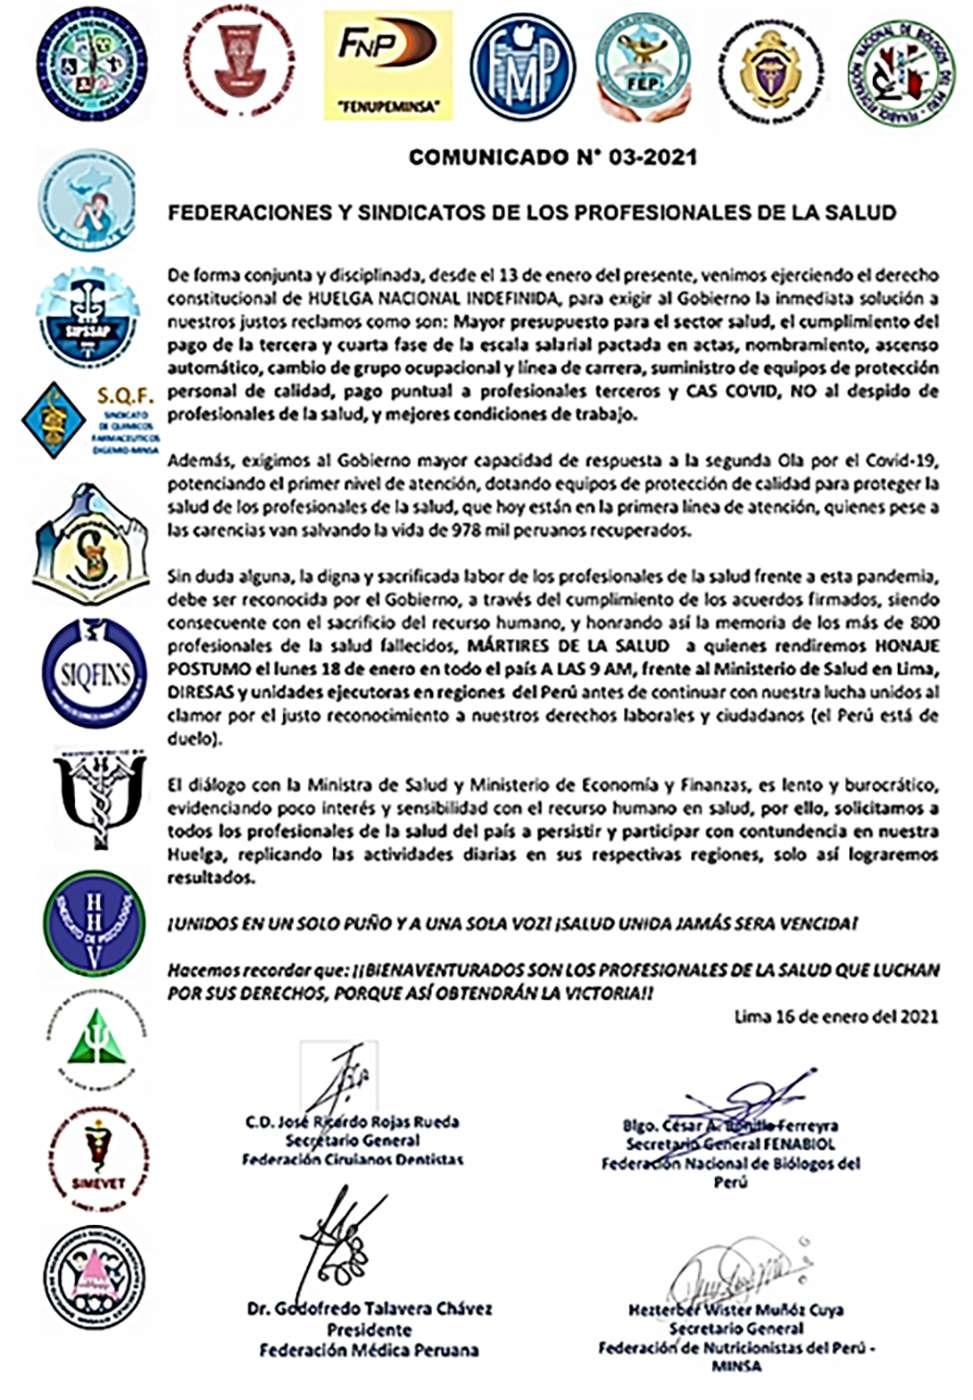 Perú Médicos decison huelga indefinida 16 1 2021